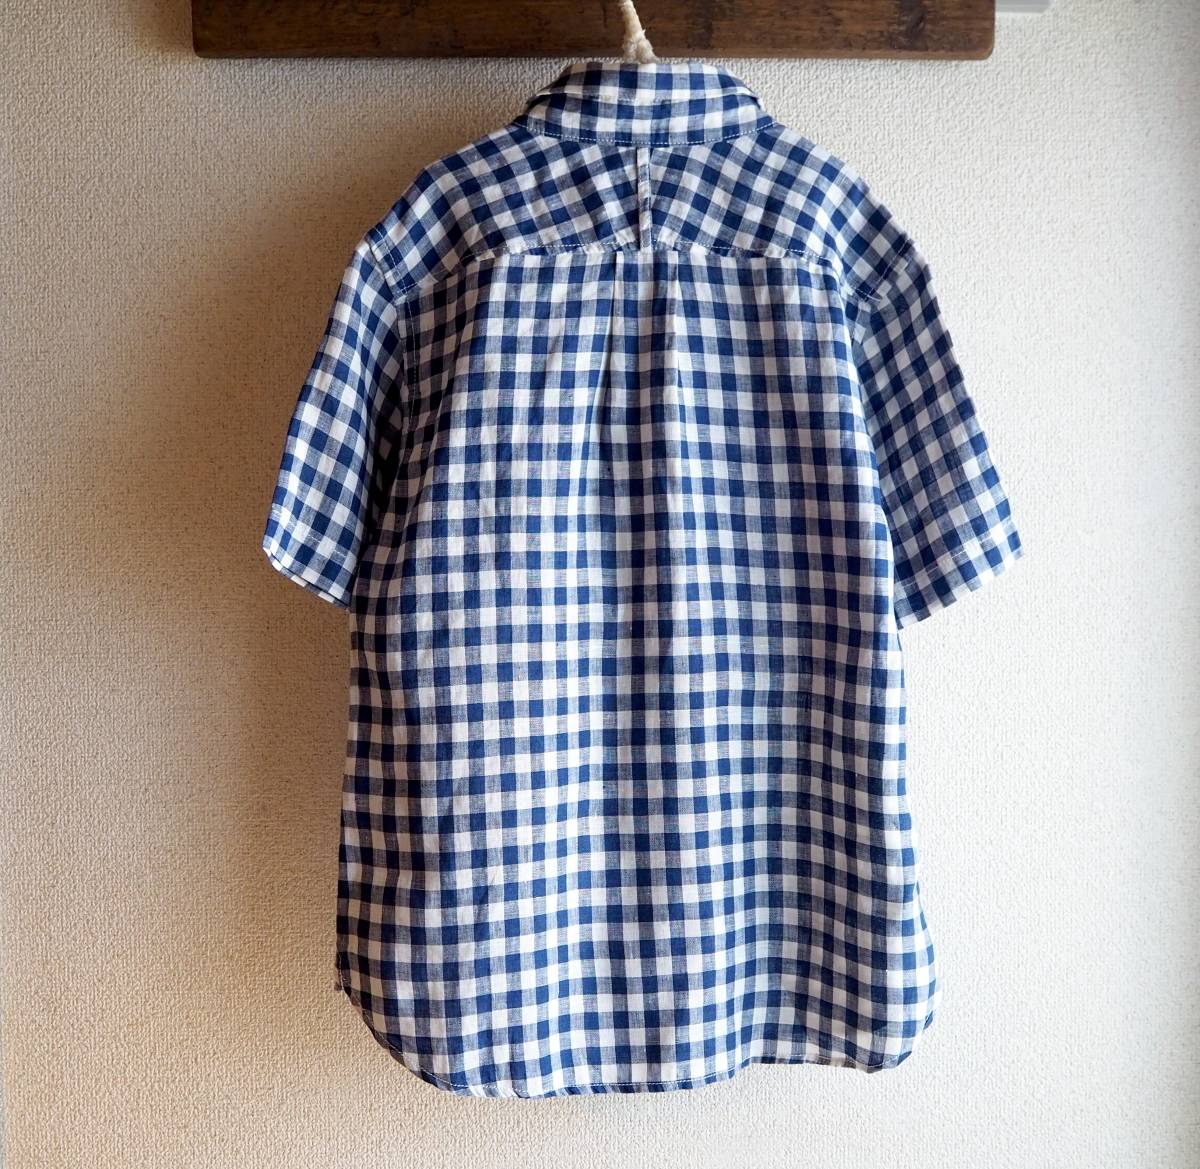 *prit プリット*ギンガムチェック柄 半袖シャツ ネイビー×ホワイト リネン100% 日本製_画像6